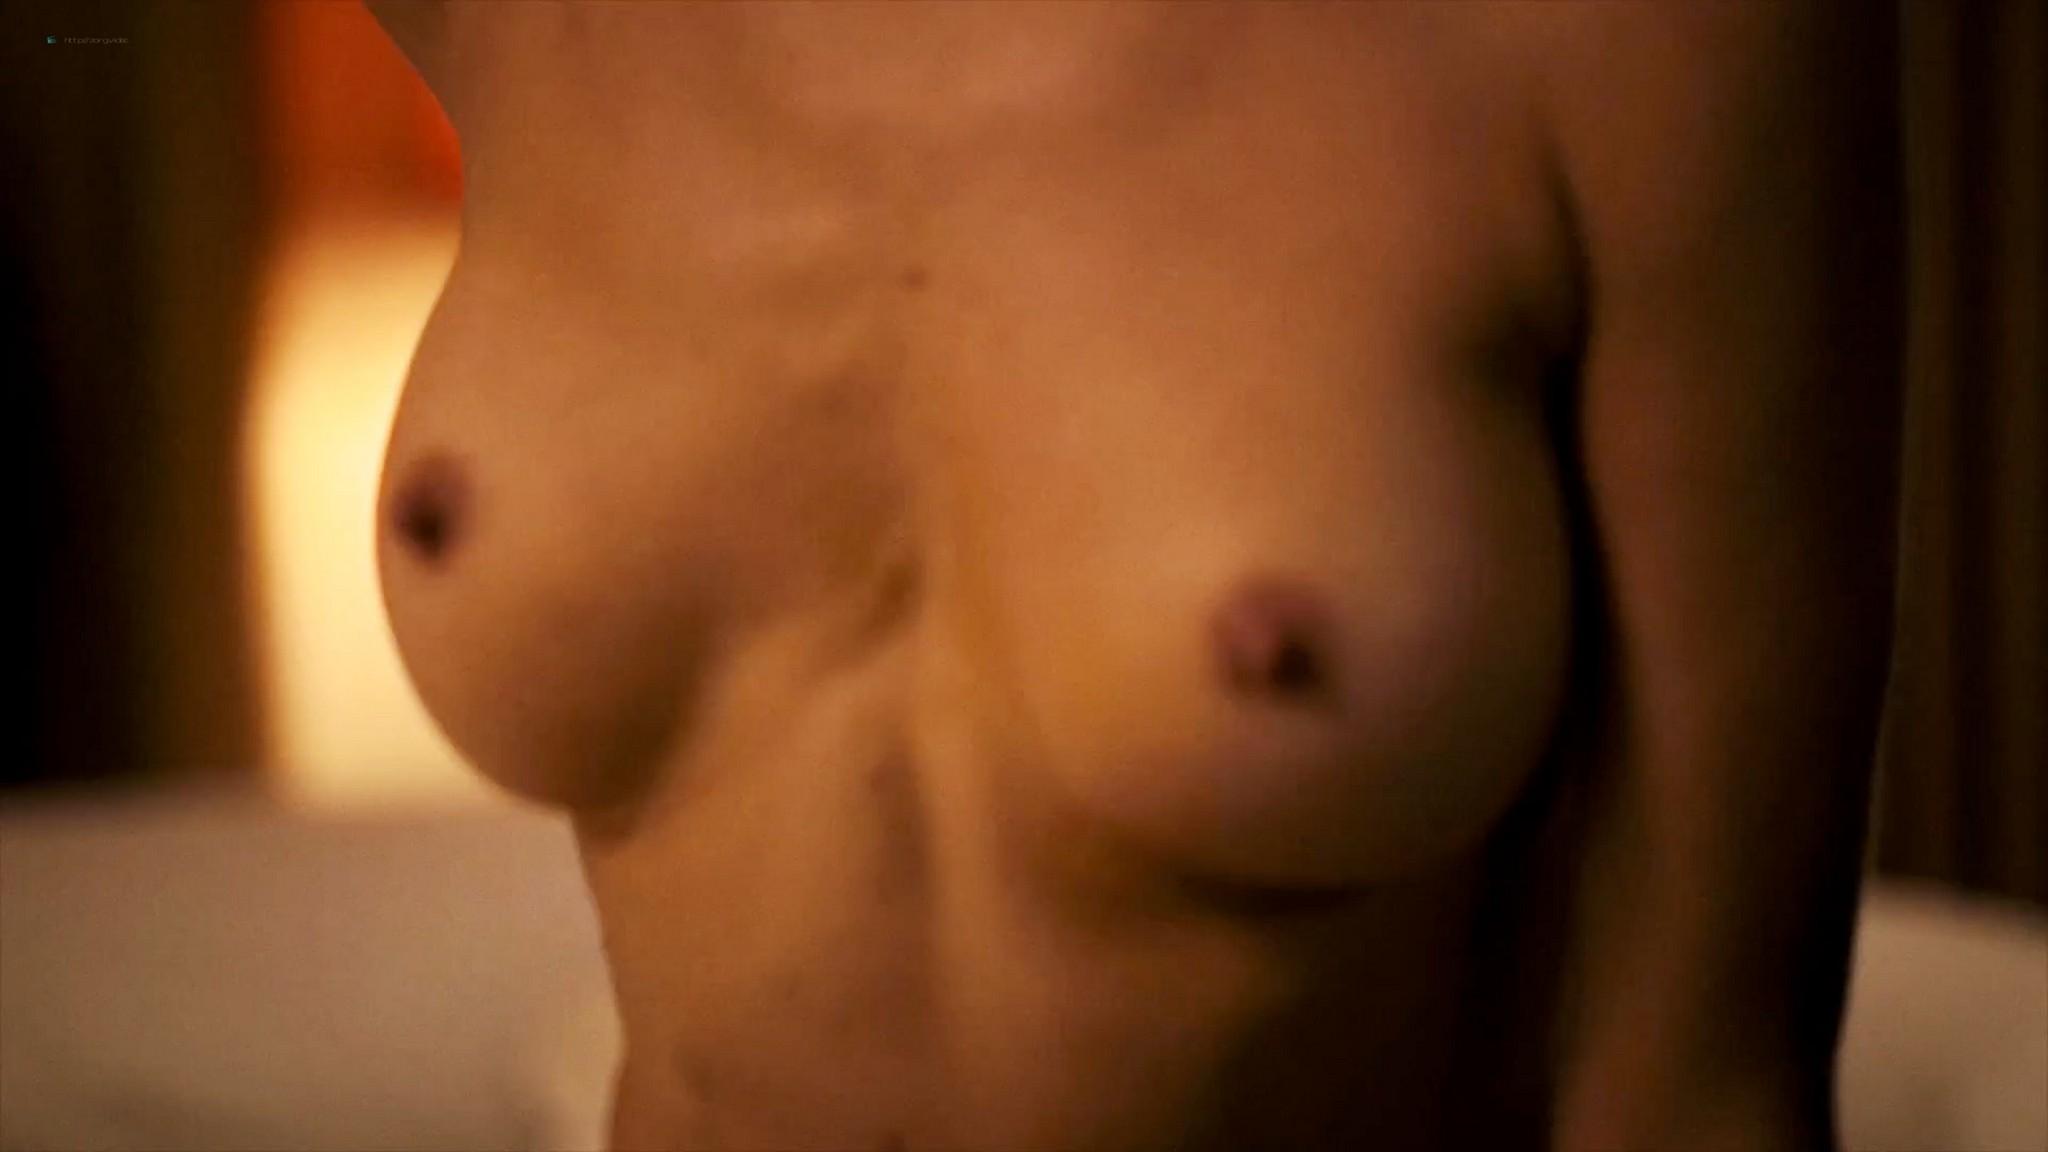 Sadie Katz nude lesbian sex with Victoria De Mare - Hanukkah (2019) HD 1080p Web (11)